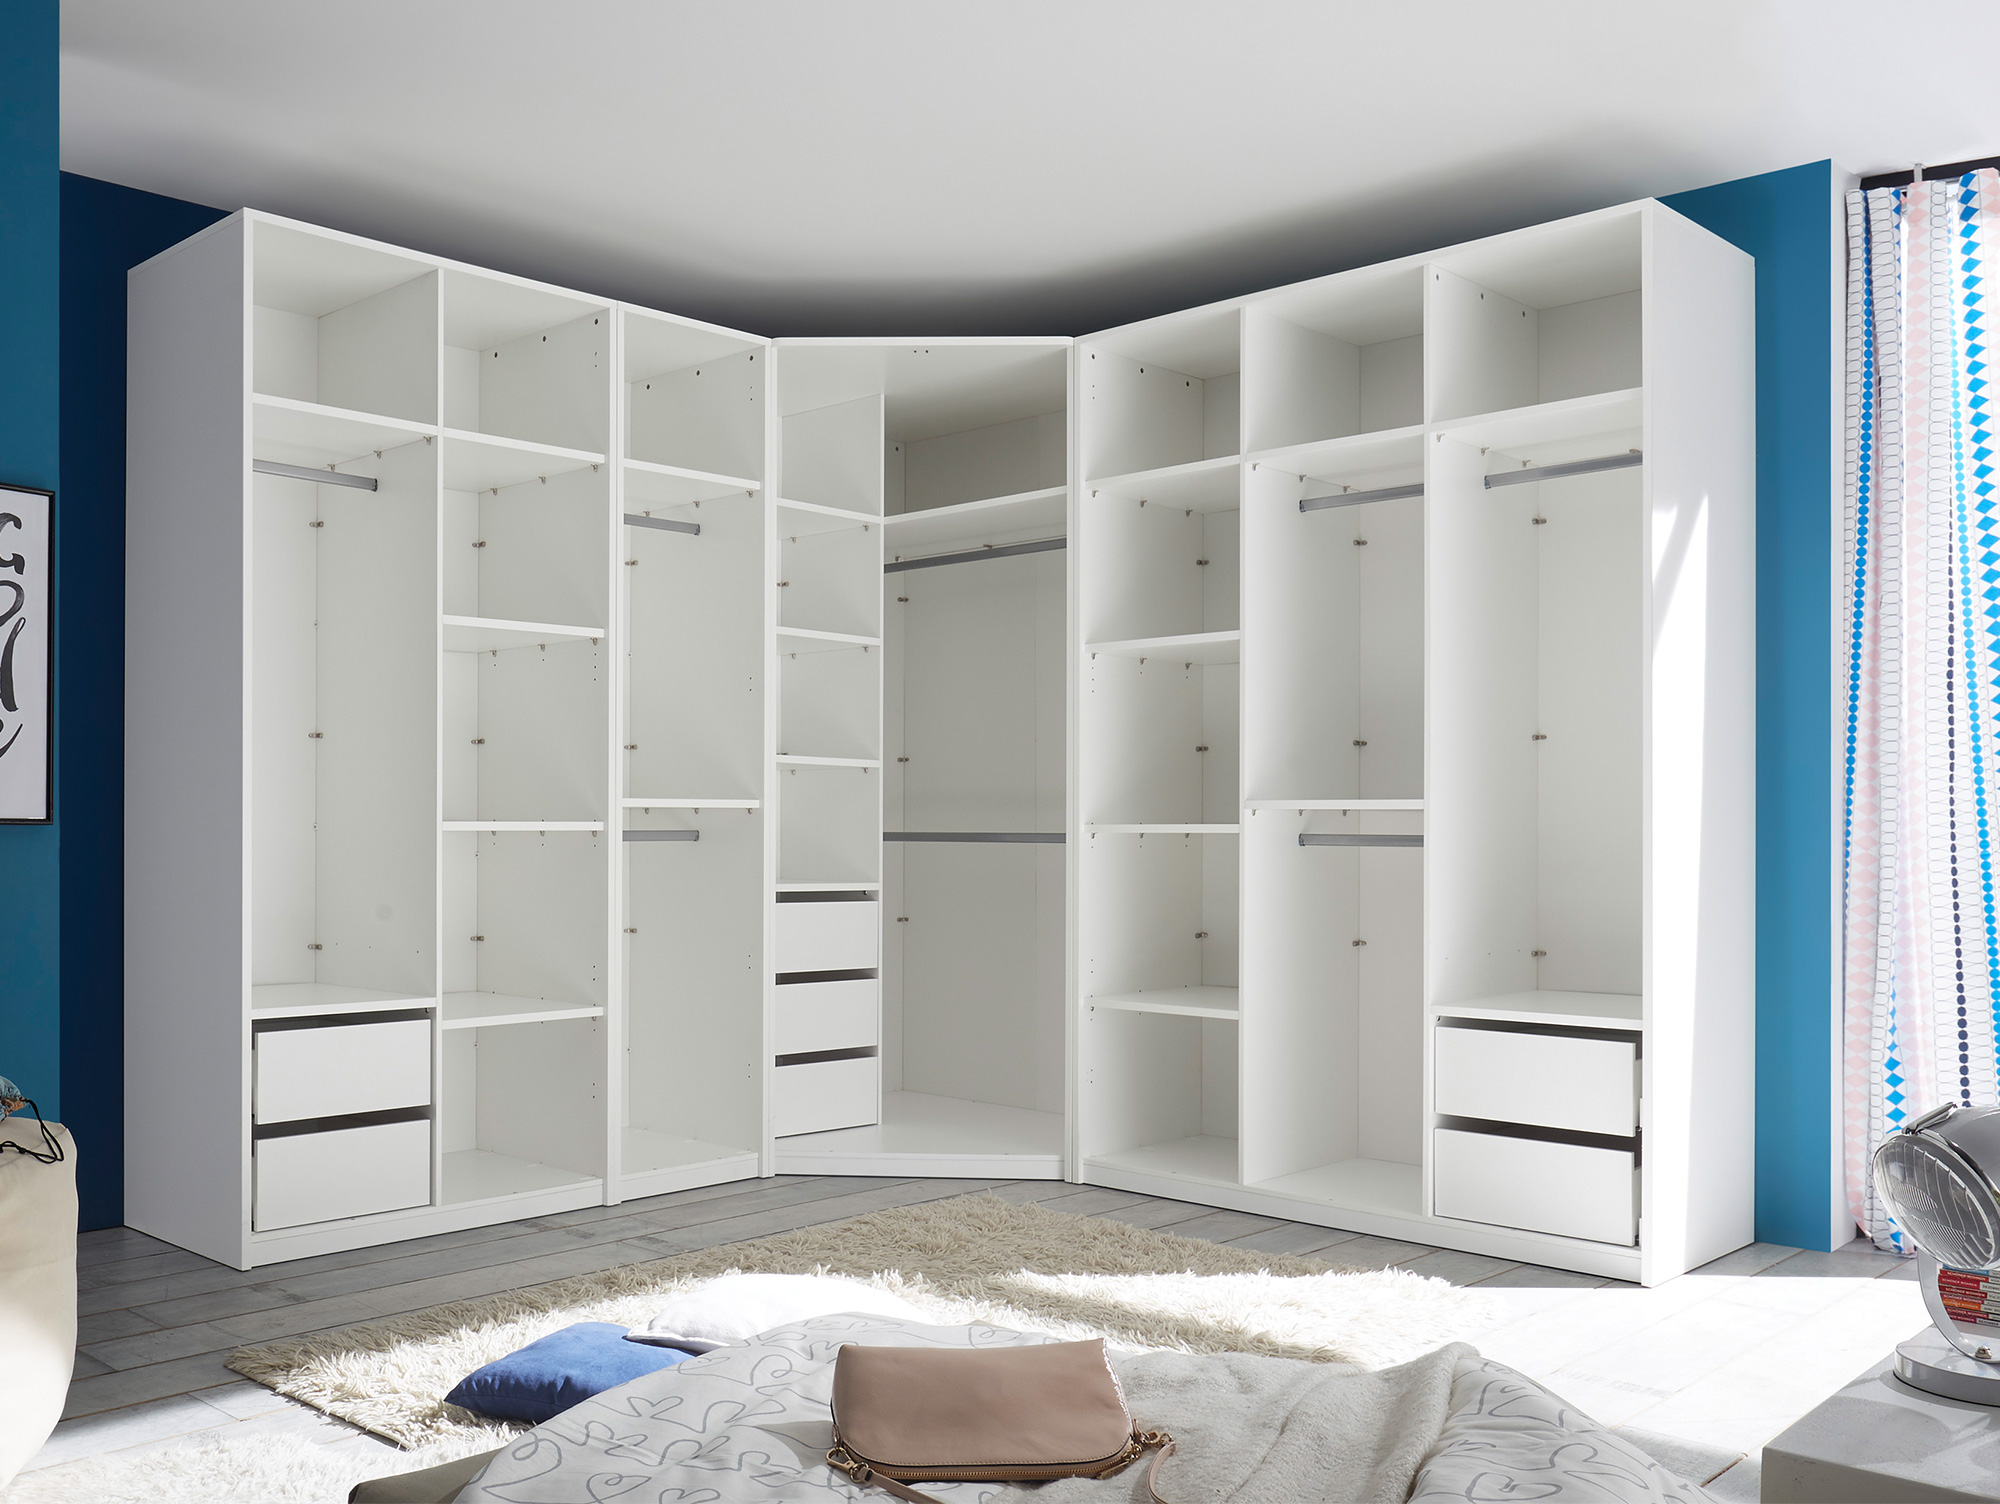 melbourne begehbarer kleiderschrank set ohne t ren. Black Bedroom Furniture Sets. Home Design Ideas